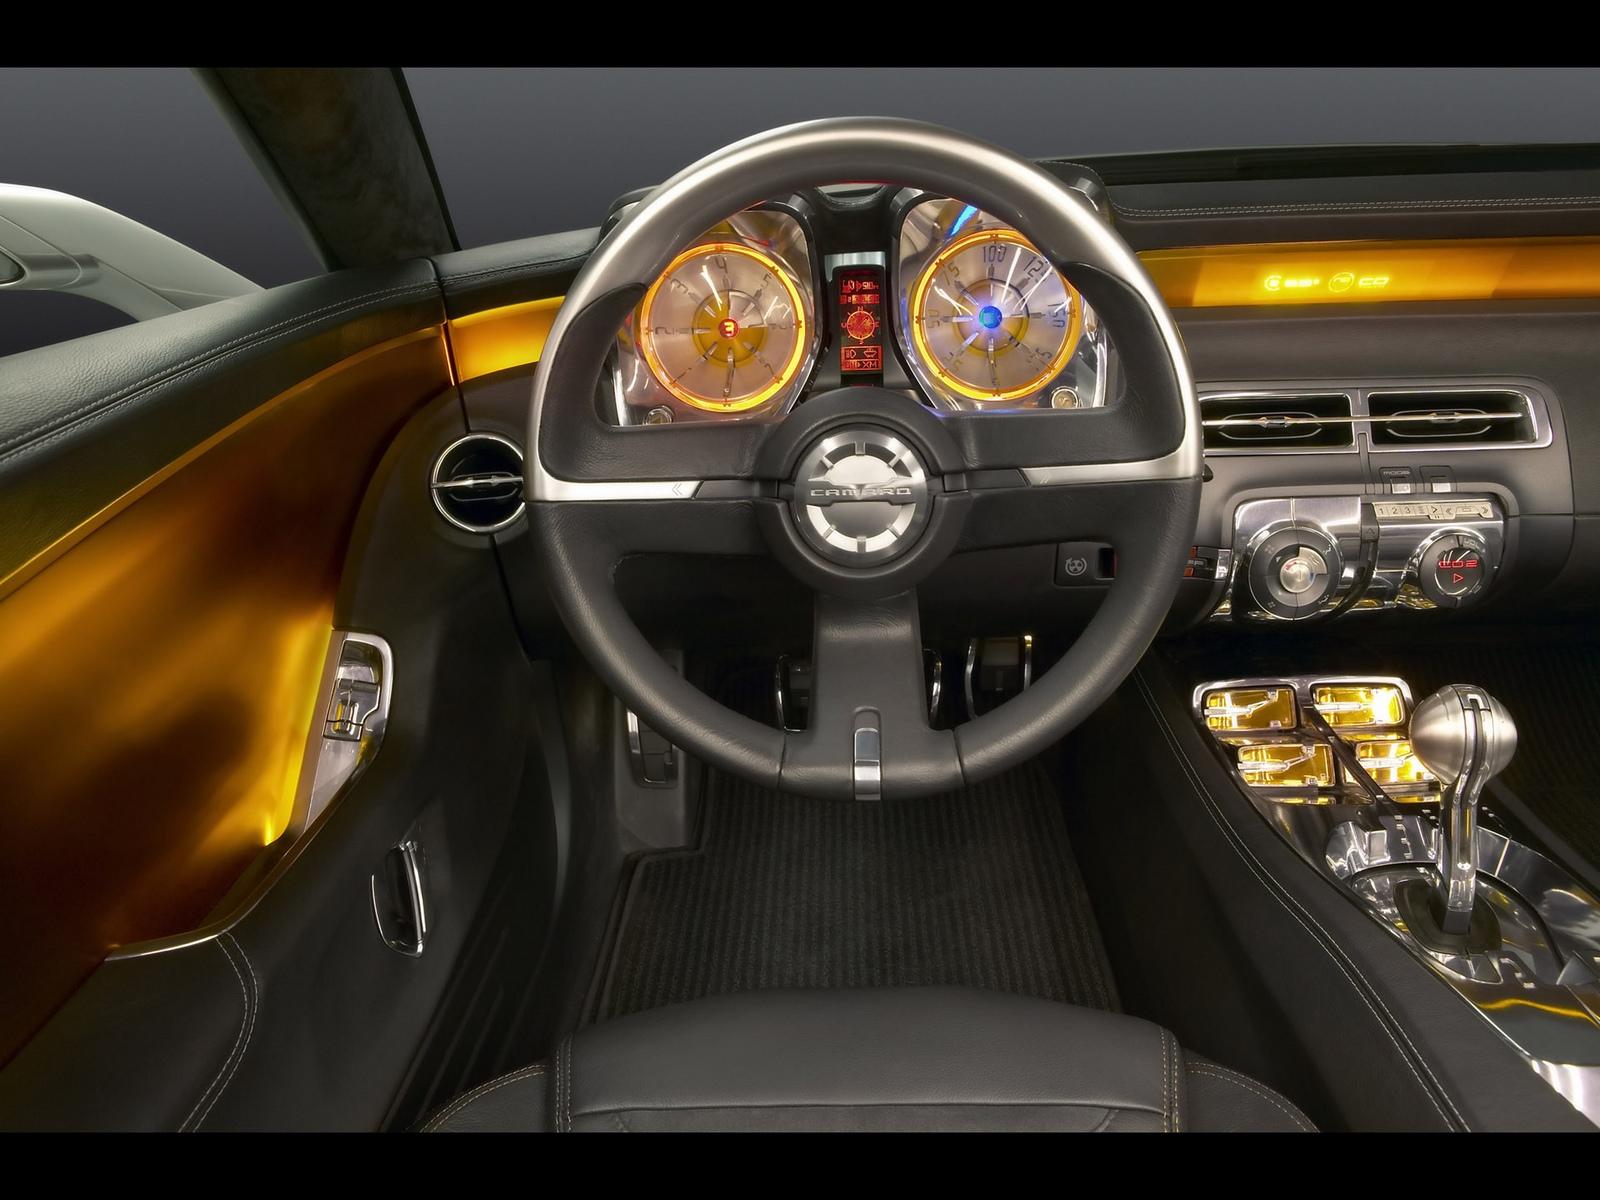 http://1.bp.blogspot.com/-UbDozPbmVEE/UBMOhk_KJvI/AAAAAAAAA68/Dz3KzNE3-nQ/s1600/cars_0017.jpg